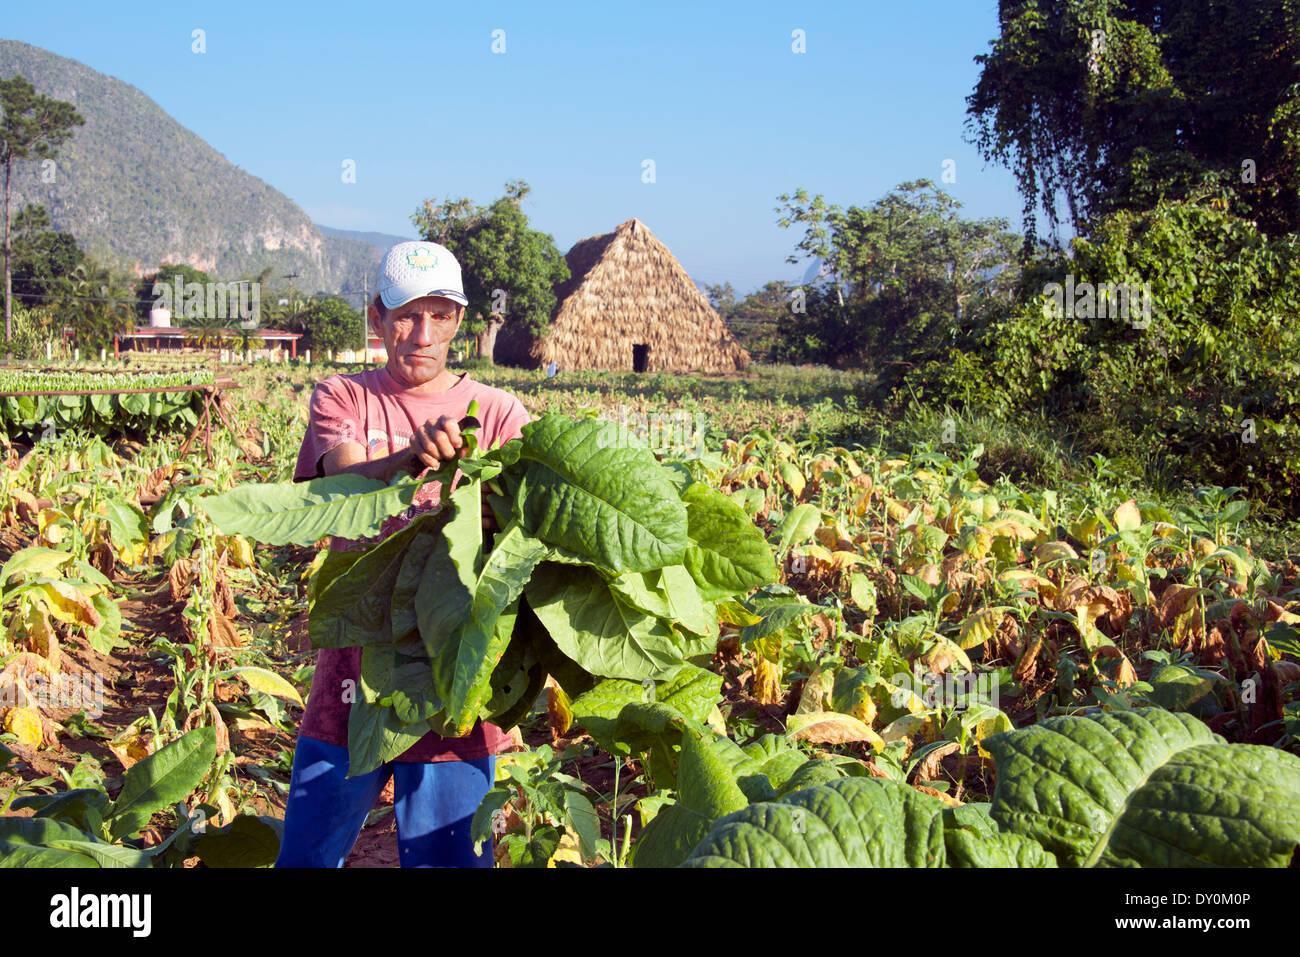 Man gathering tobacco leaves Vinales Cuba - Stock Image